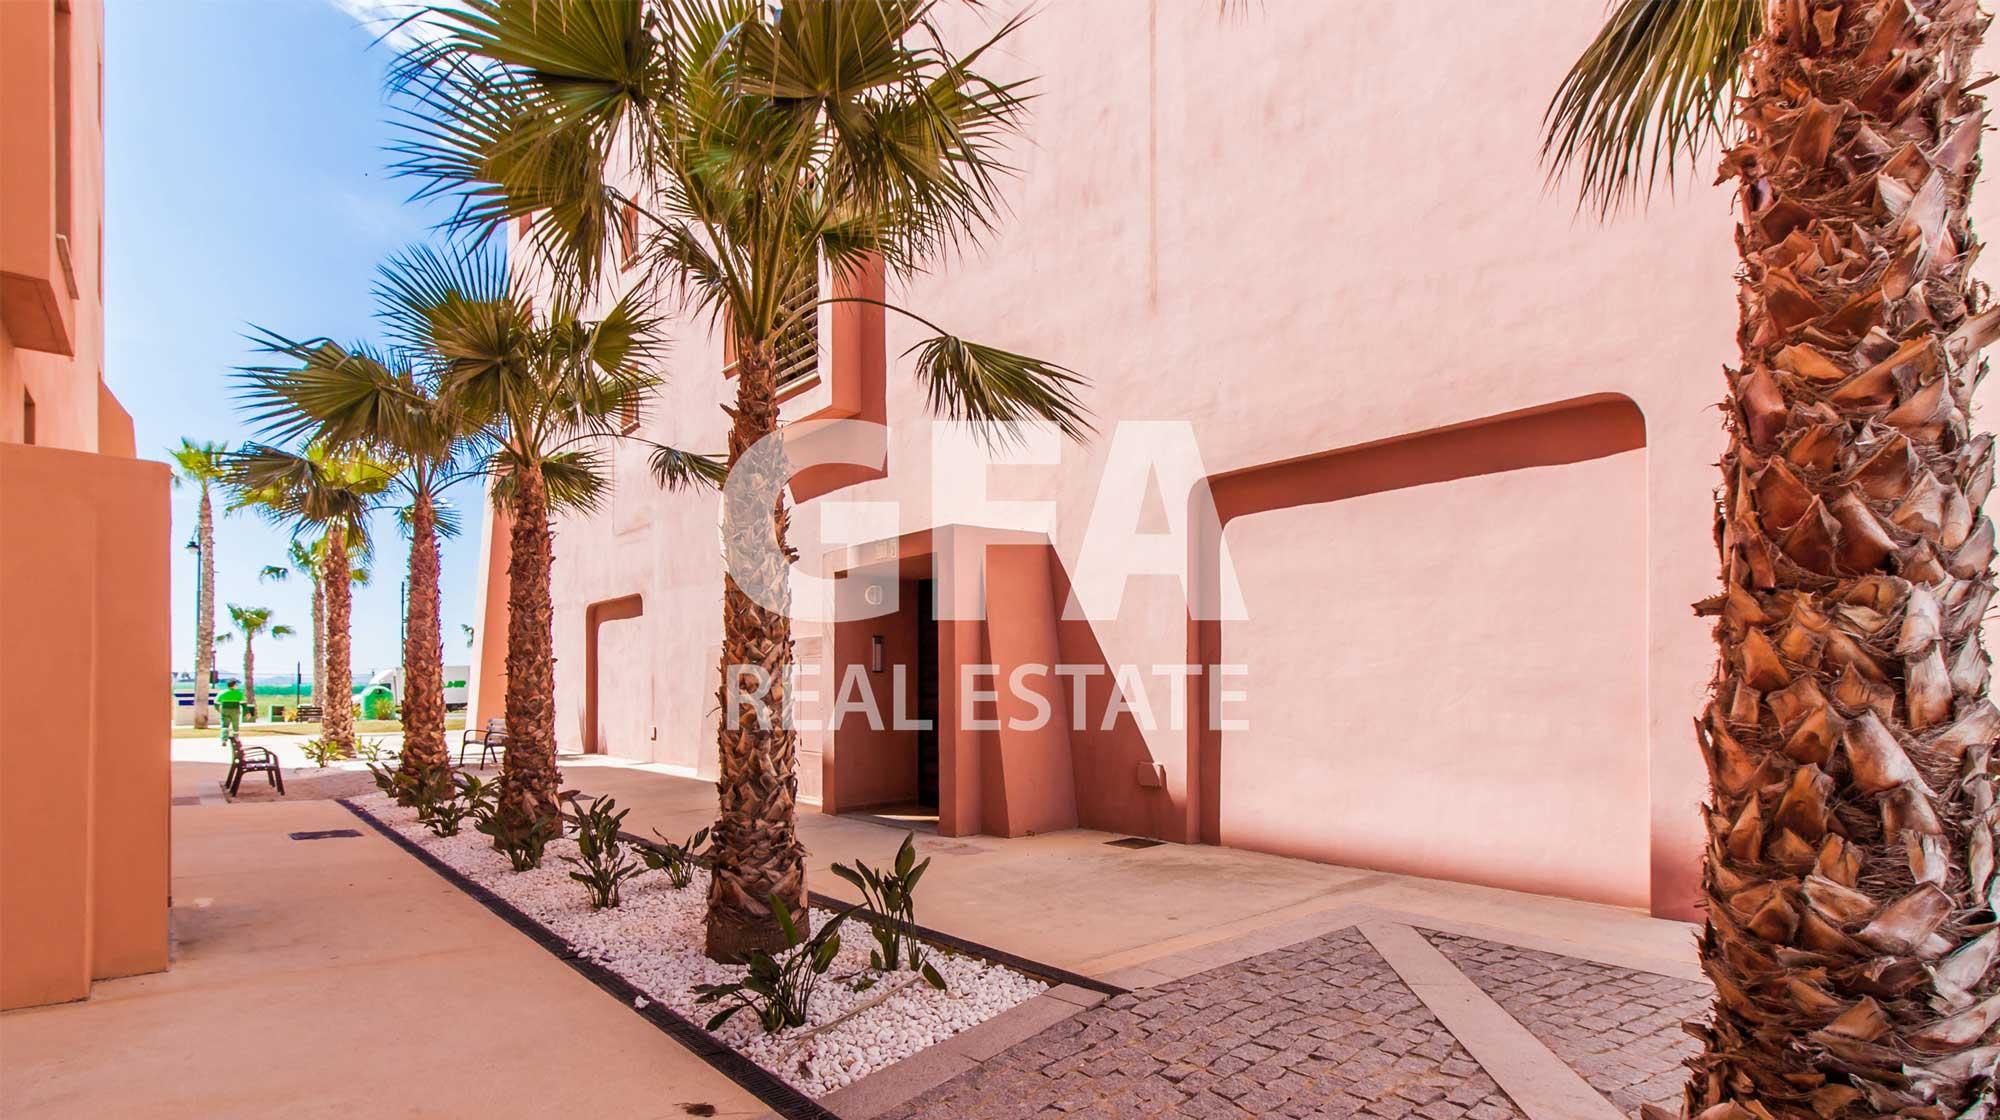 boulevard-viviendas-de-obra-nueva-resort-mar-menor (7)